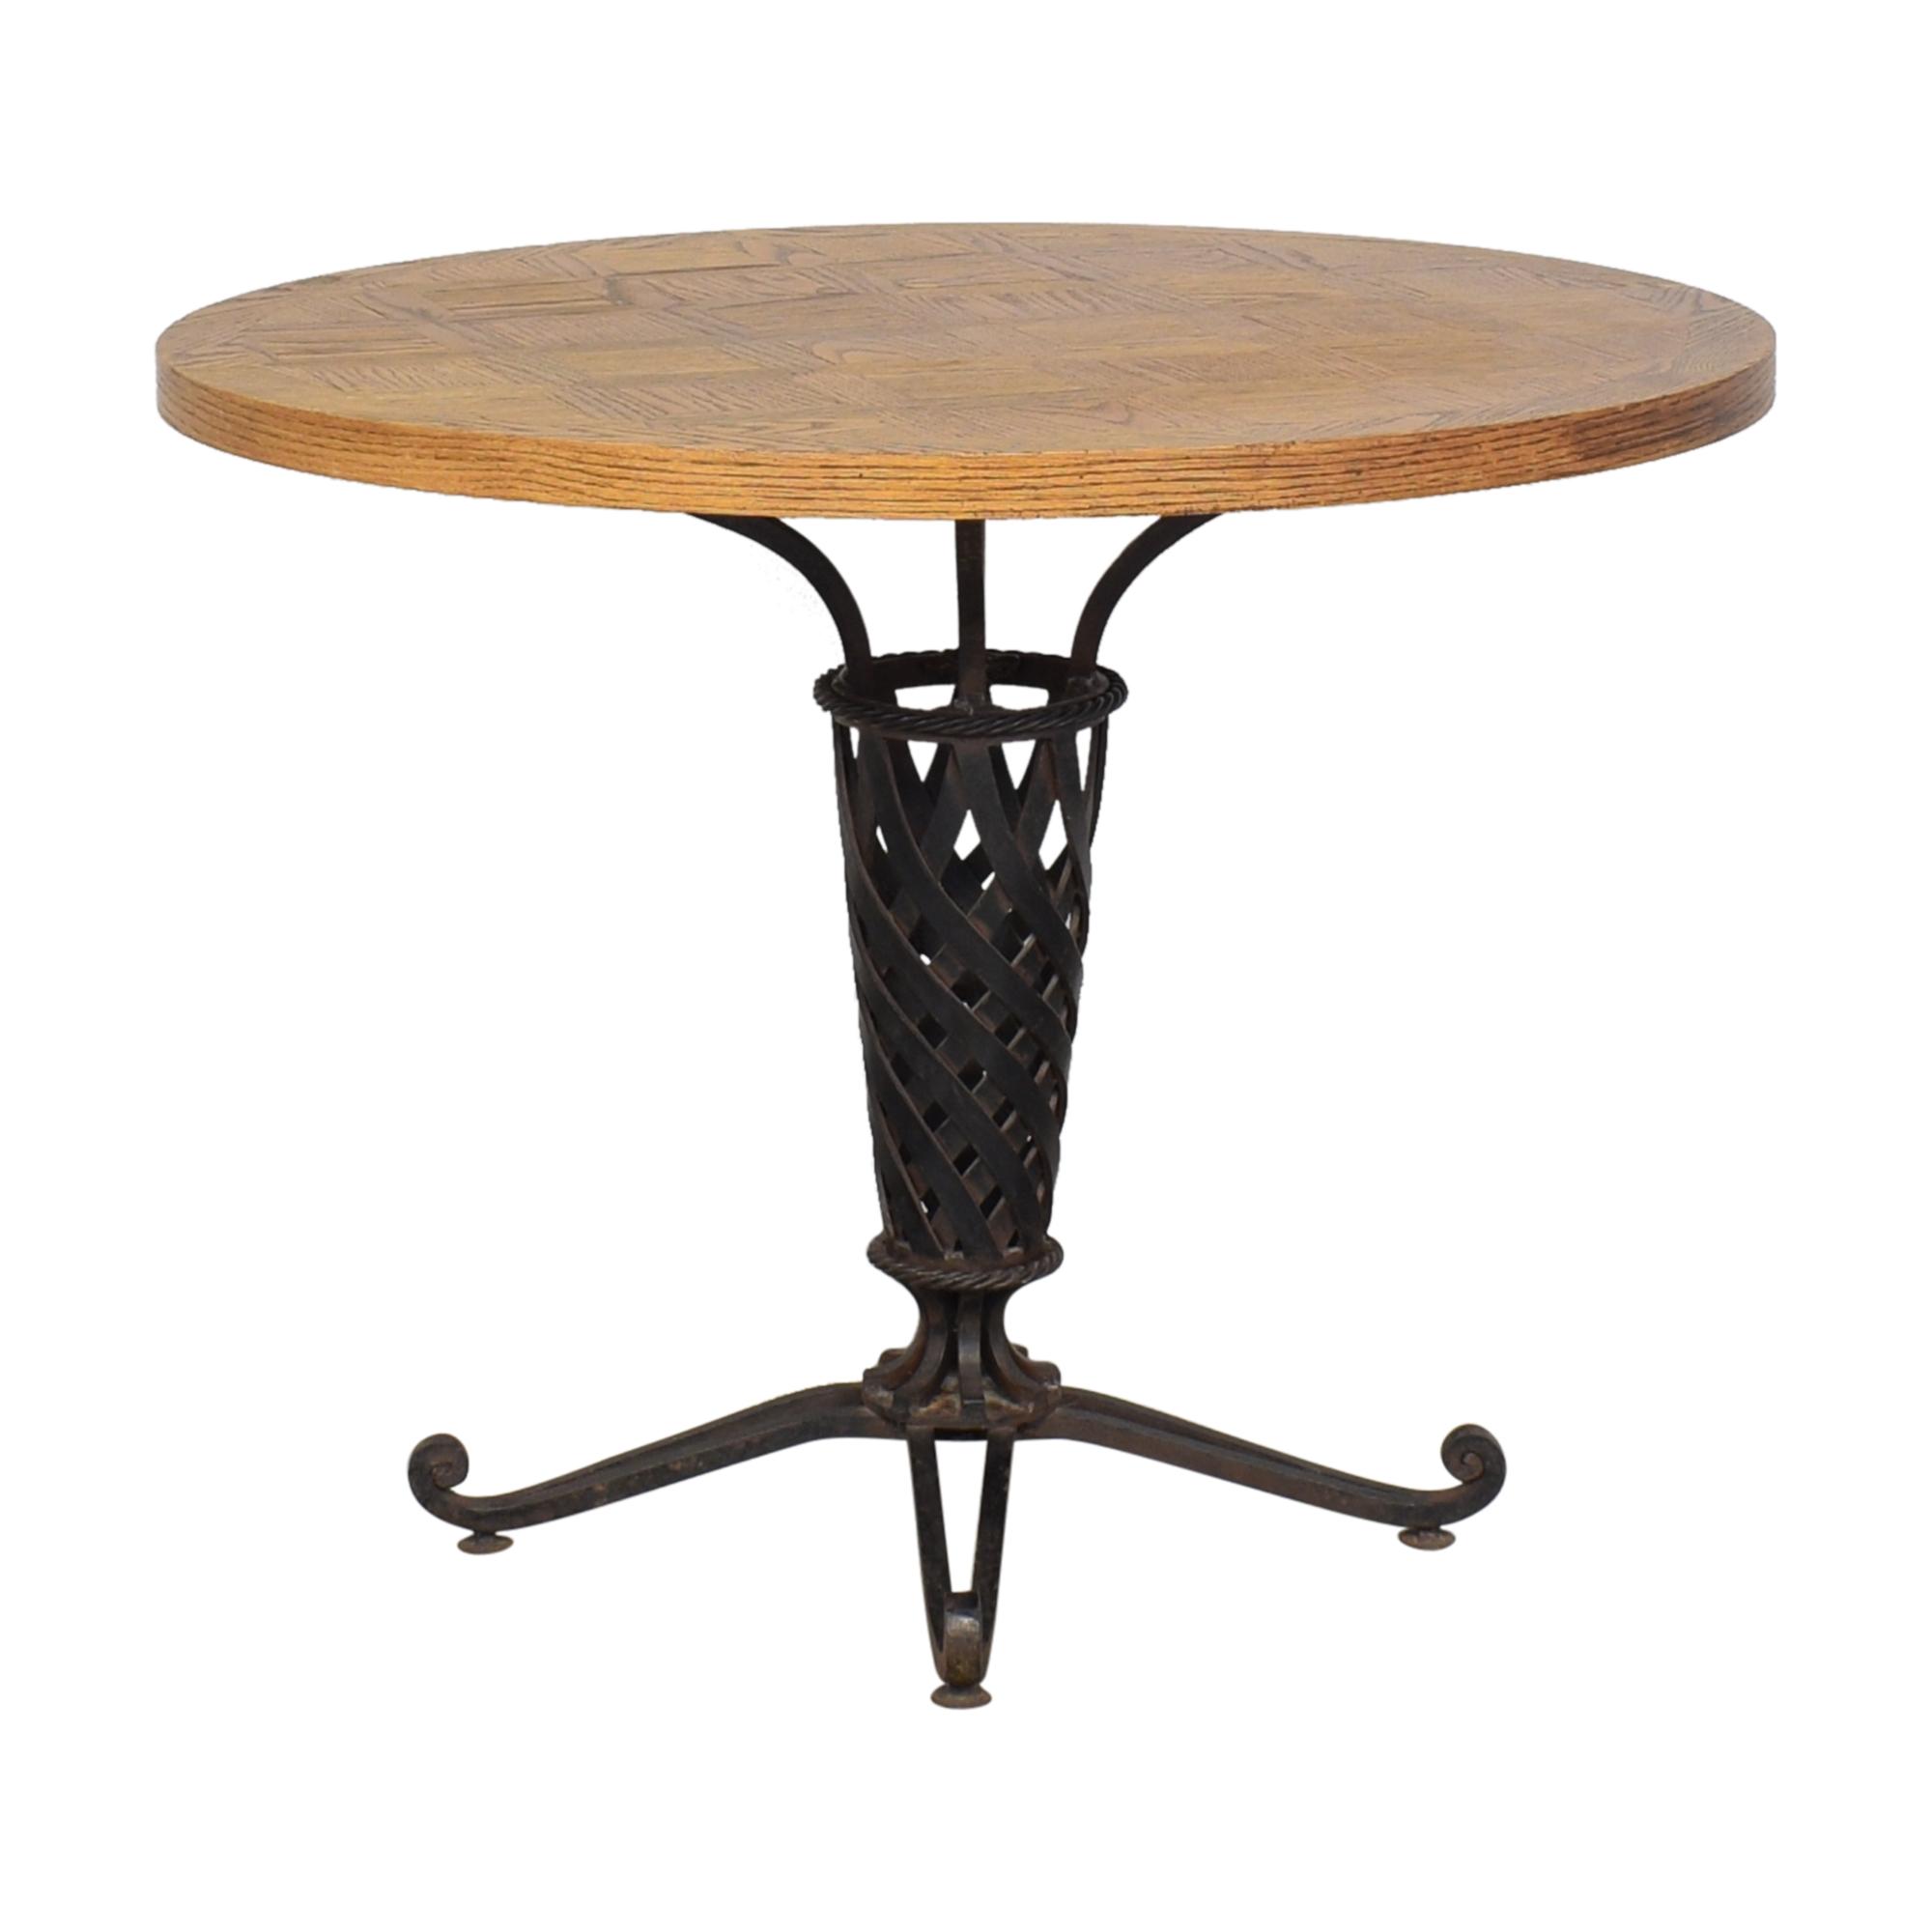 buy  Parquet Round Table online